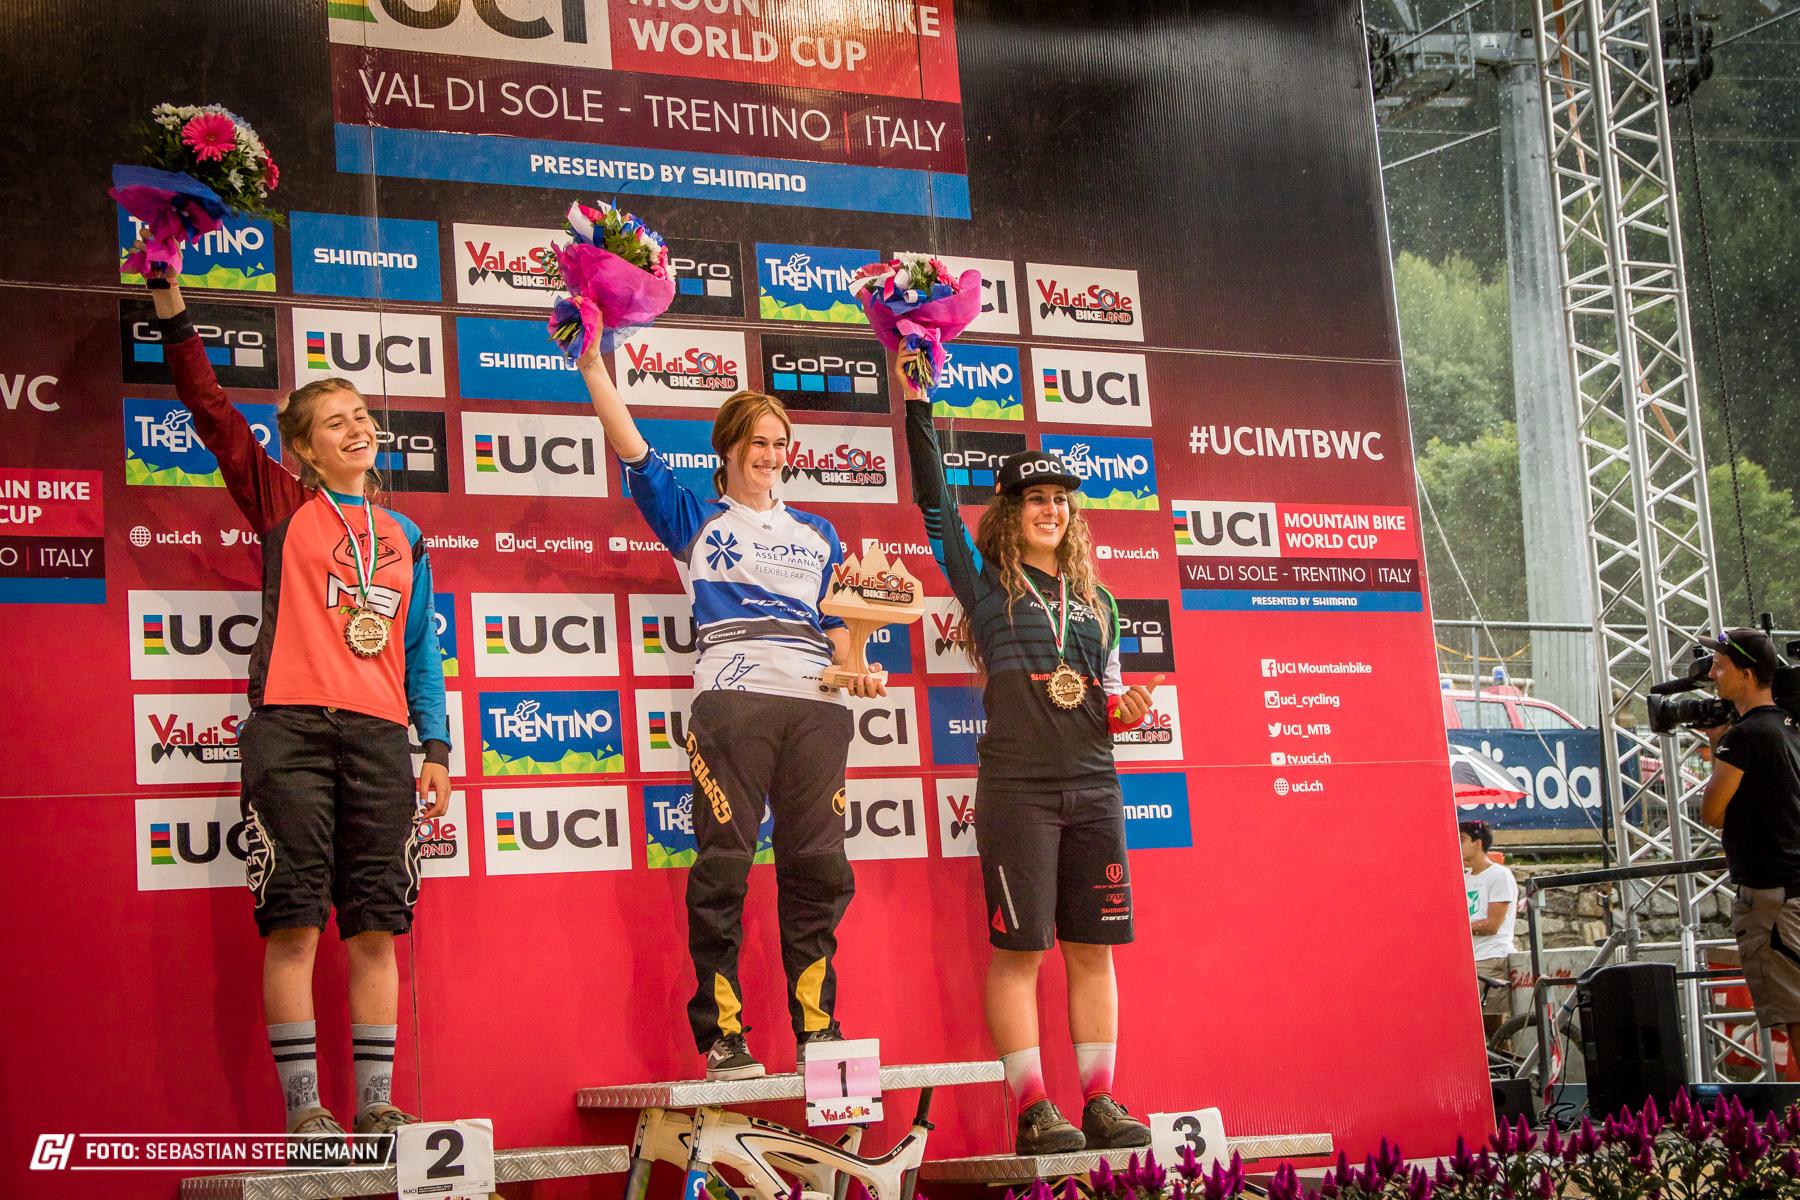 Saturday Val di Sole264 Cycleholix